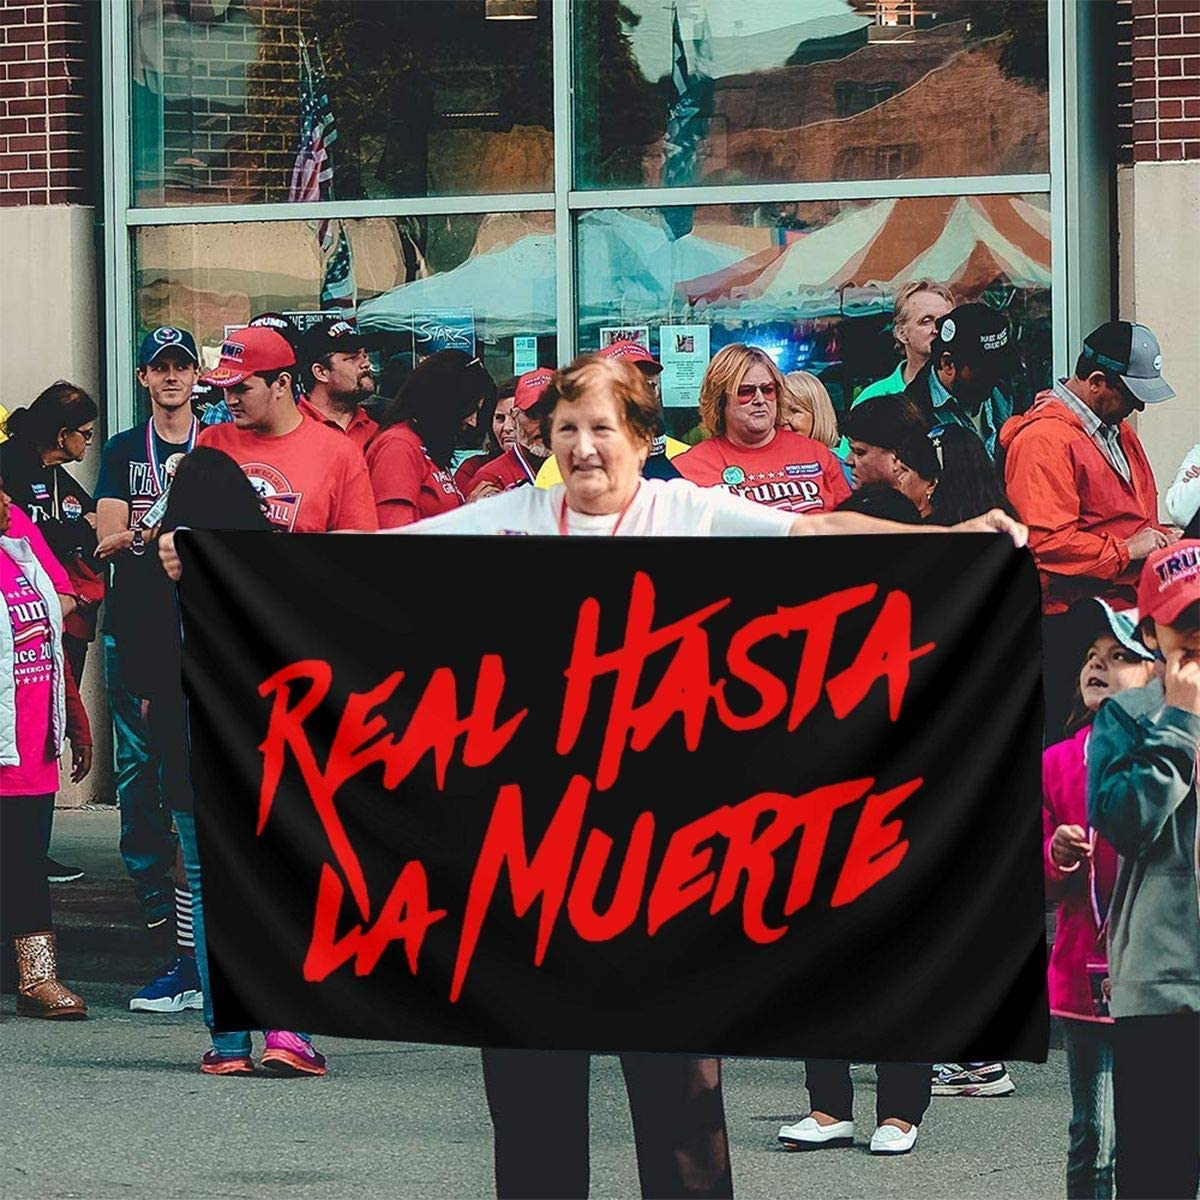 Outdoor Artificial Flag for Home Oaqueen Bandiere Real Hasta La Muerte Logo Decorative Bandieras Garden Yard Decorations 3x5 Ft